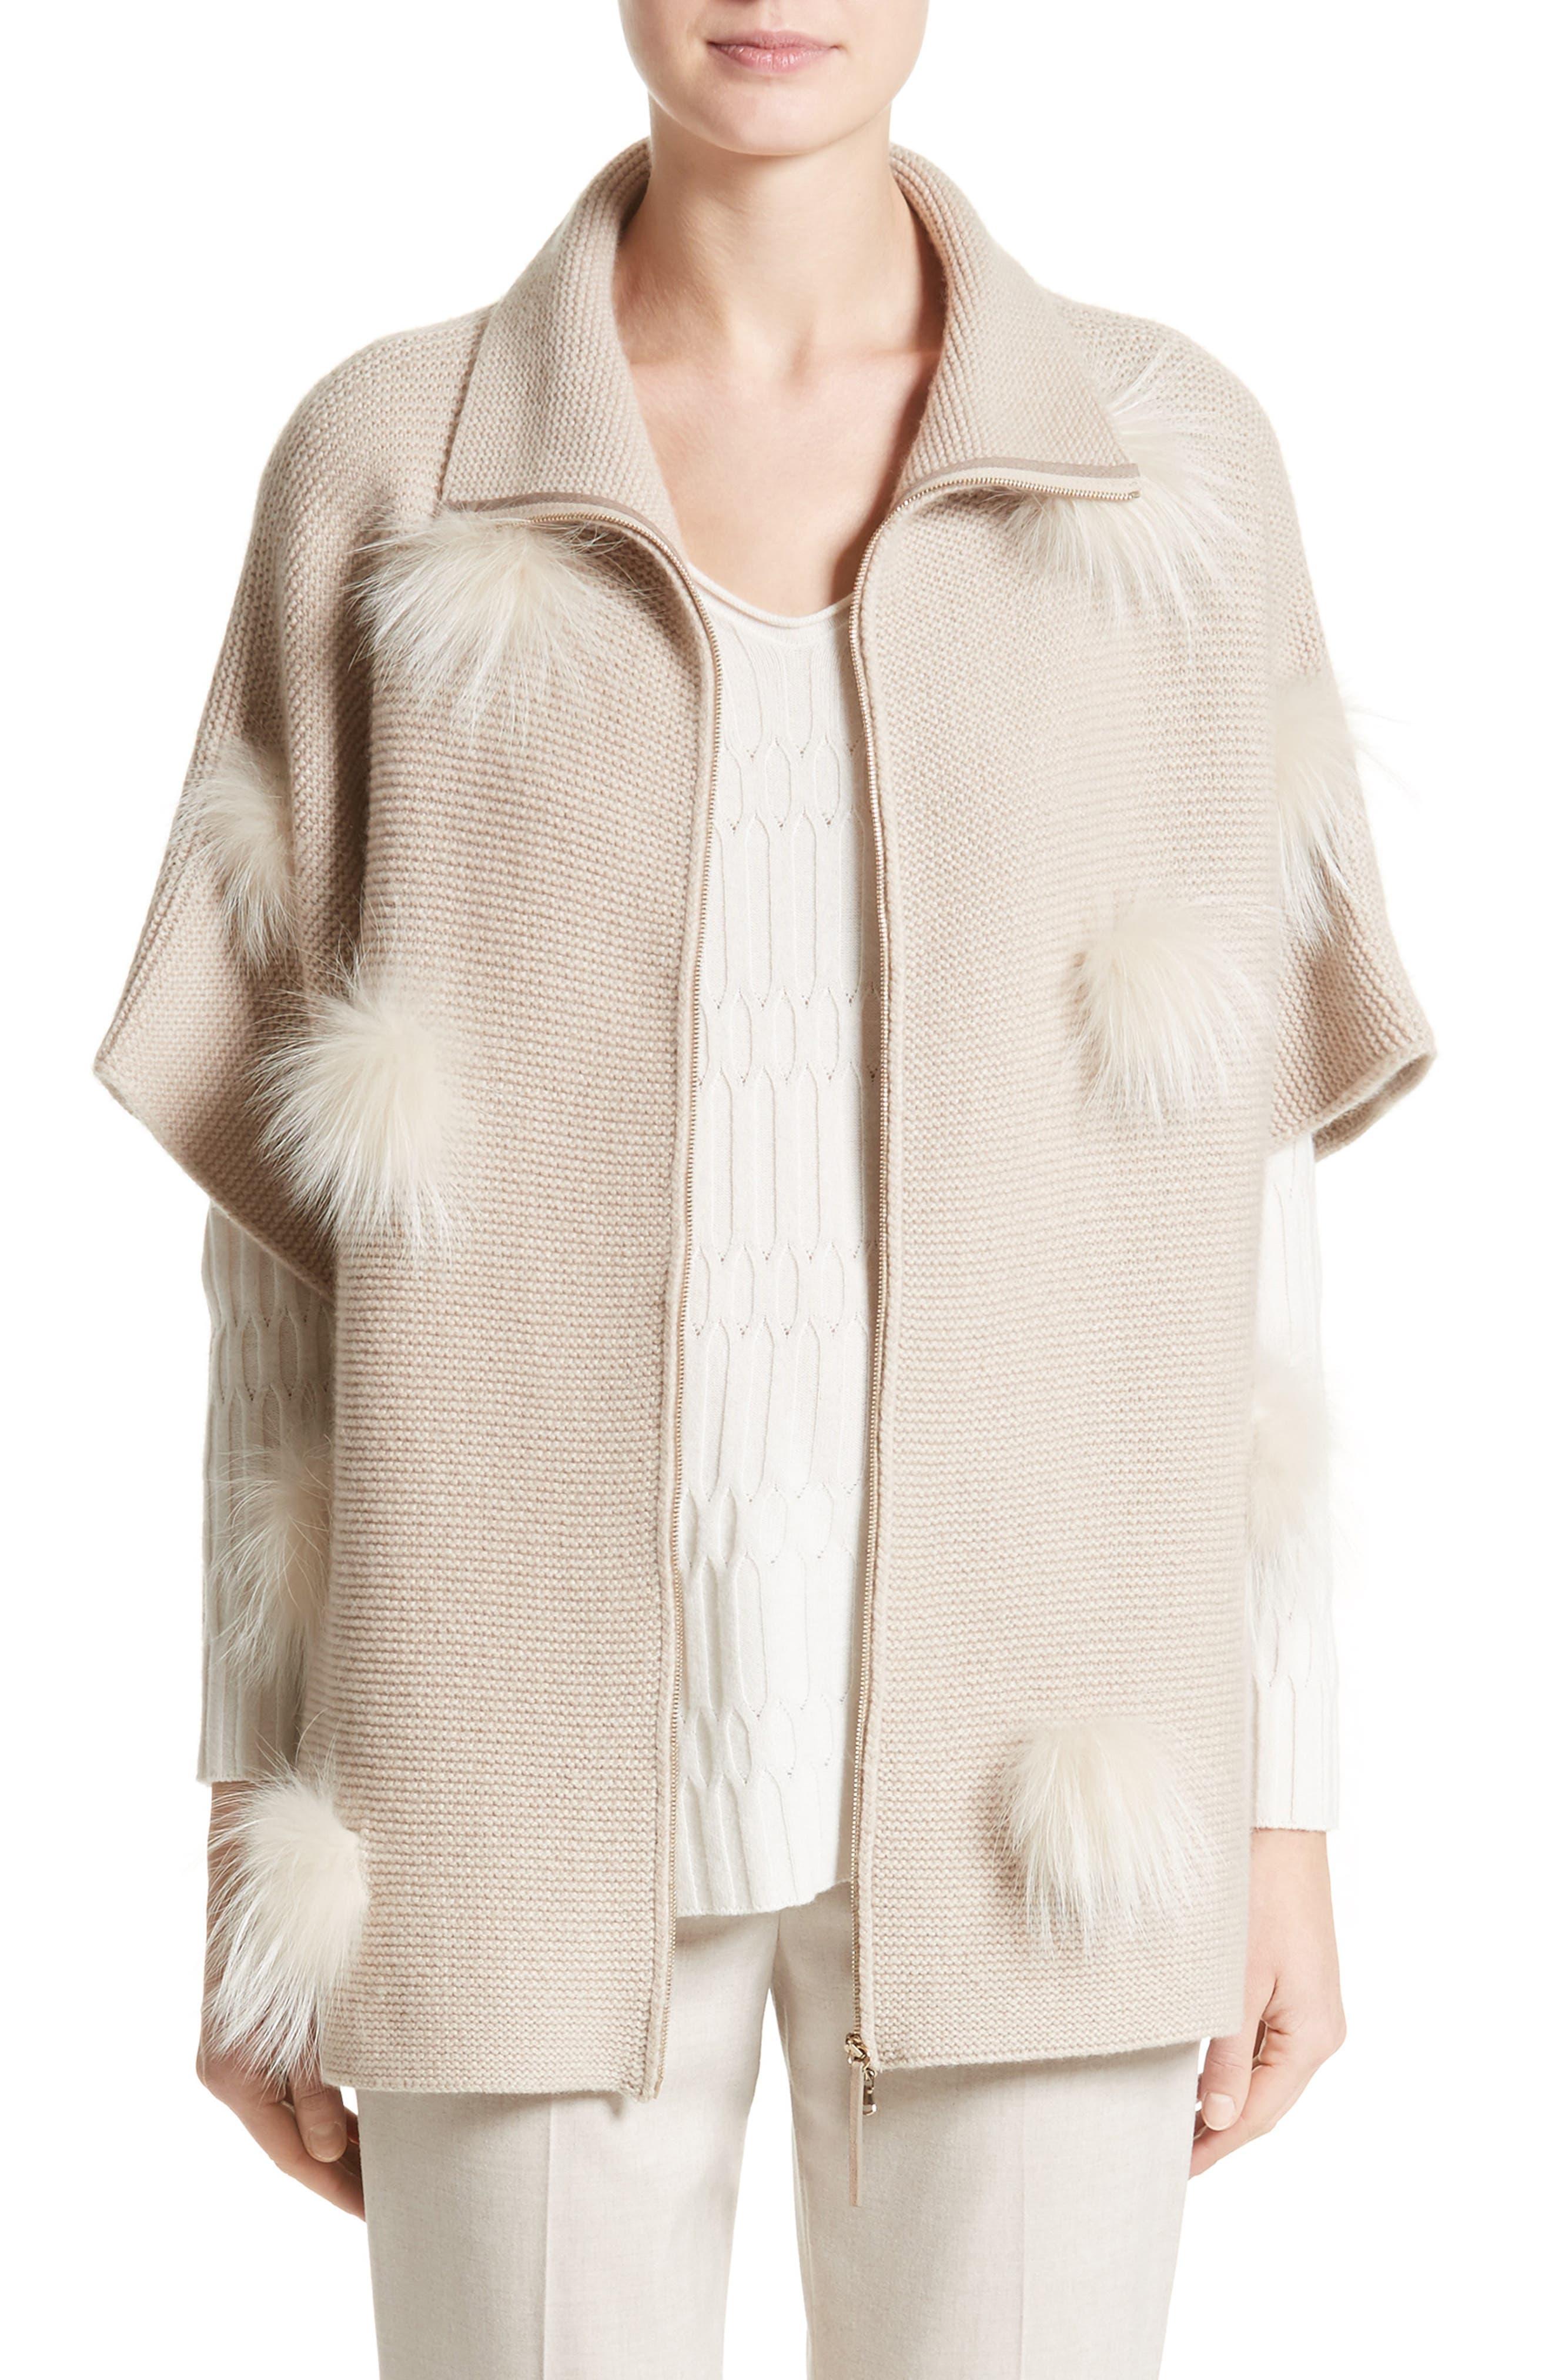 Main Image - Fabiana Filippi Micro Braid Cashmere Zip Cardigan with Genuine Fox Fur Trim